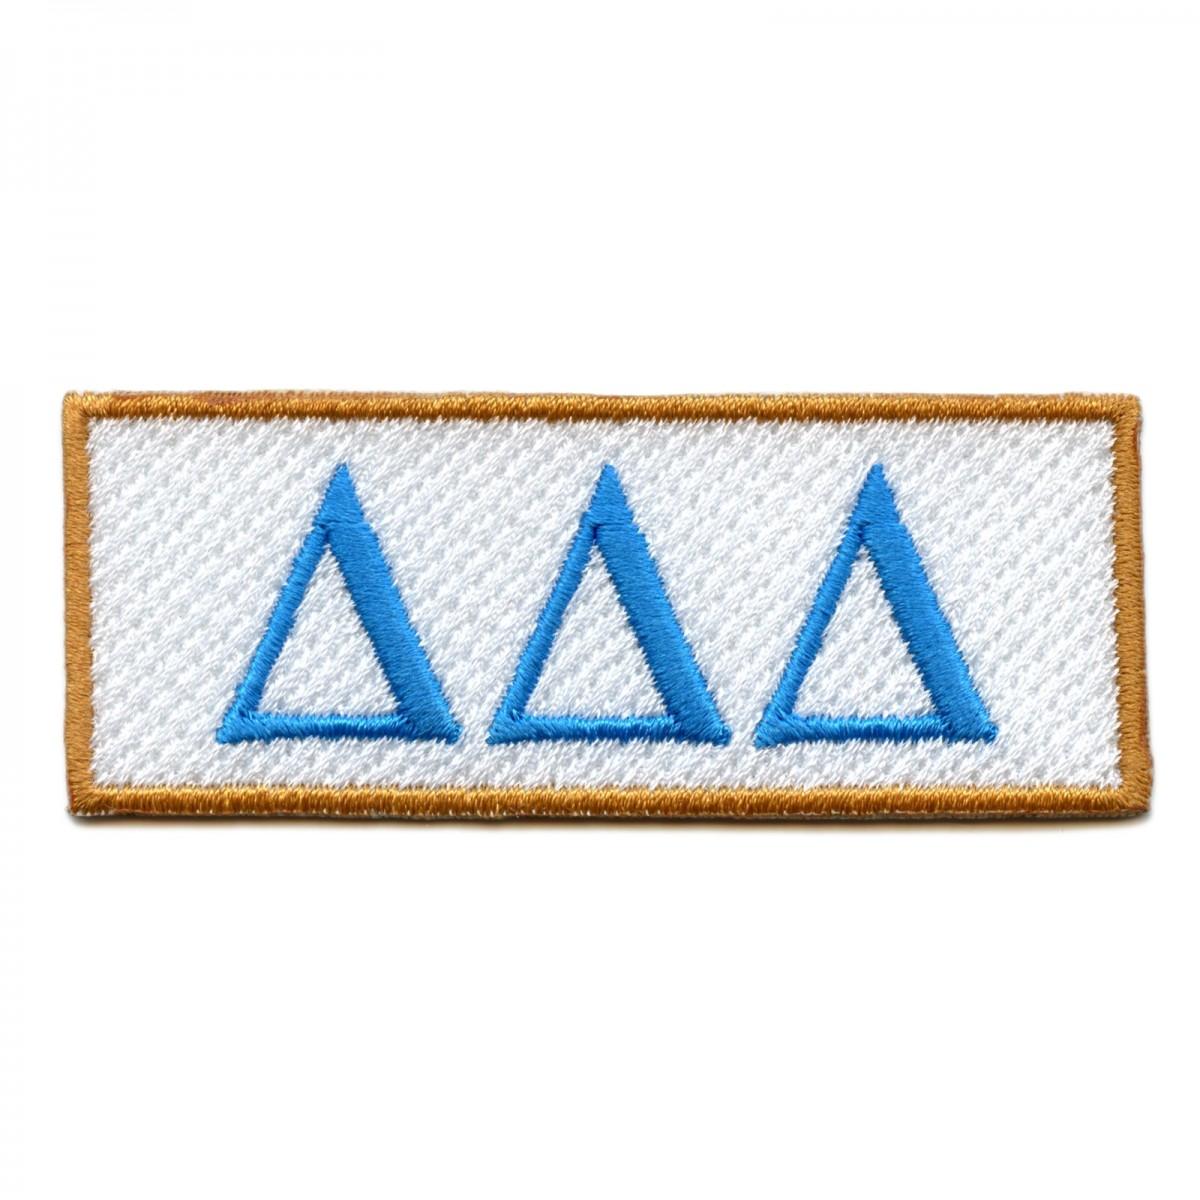 Delta Delta Delta \'Tri Delta\' Sorority Box Logo Iron On Patch.